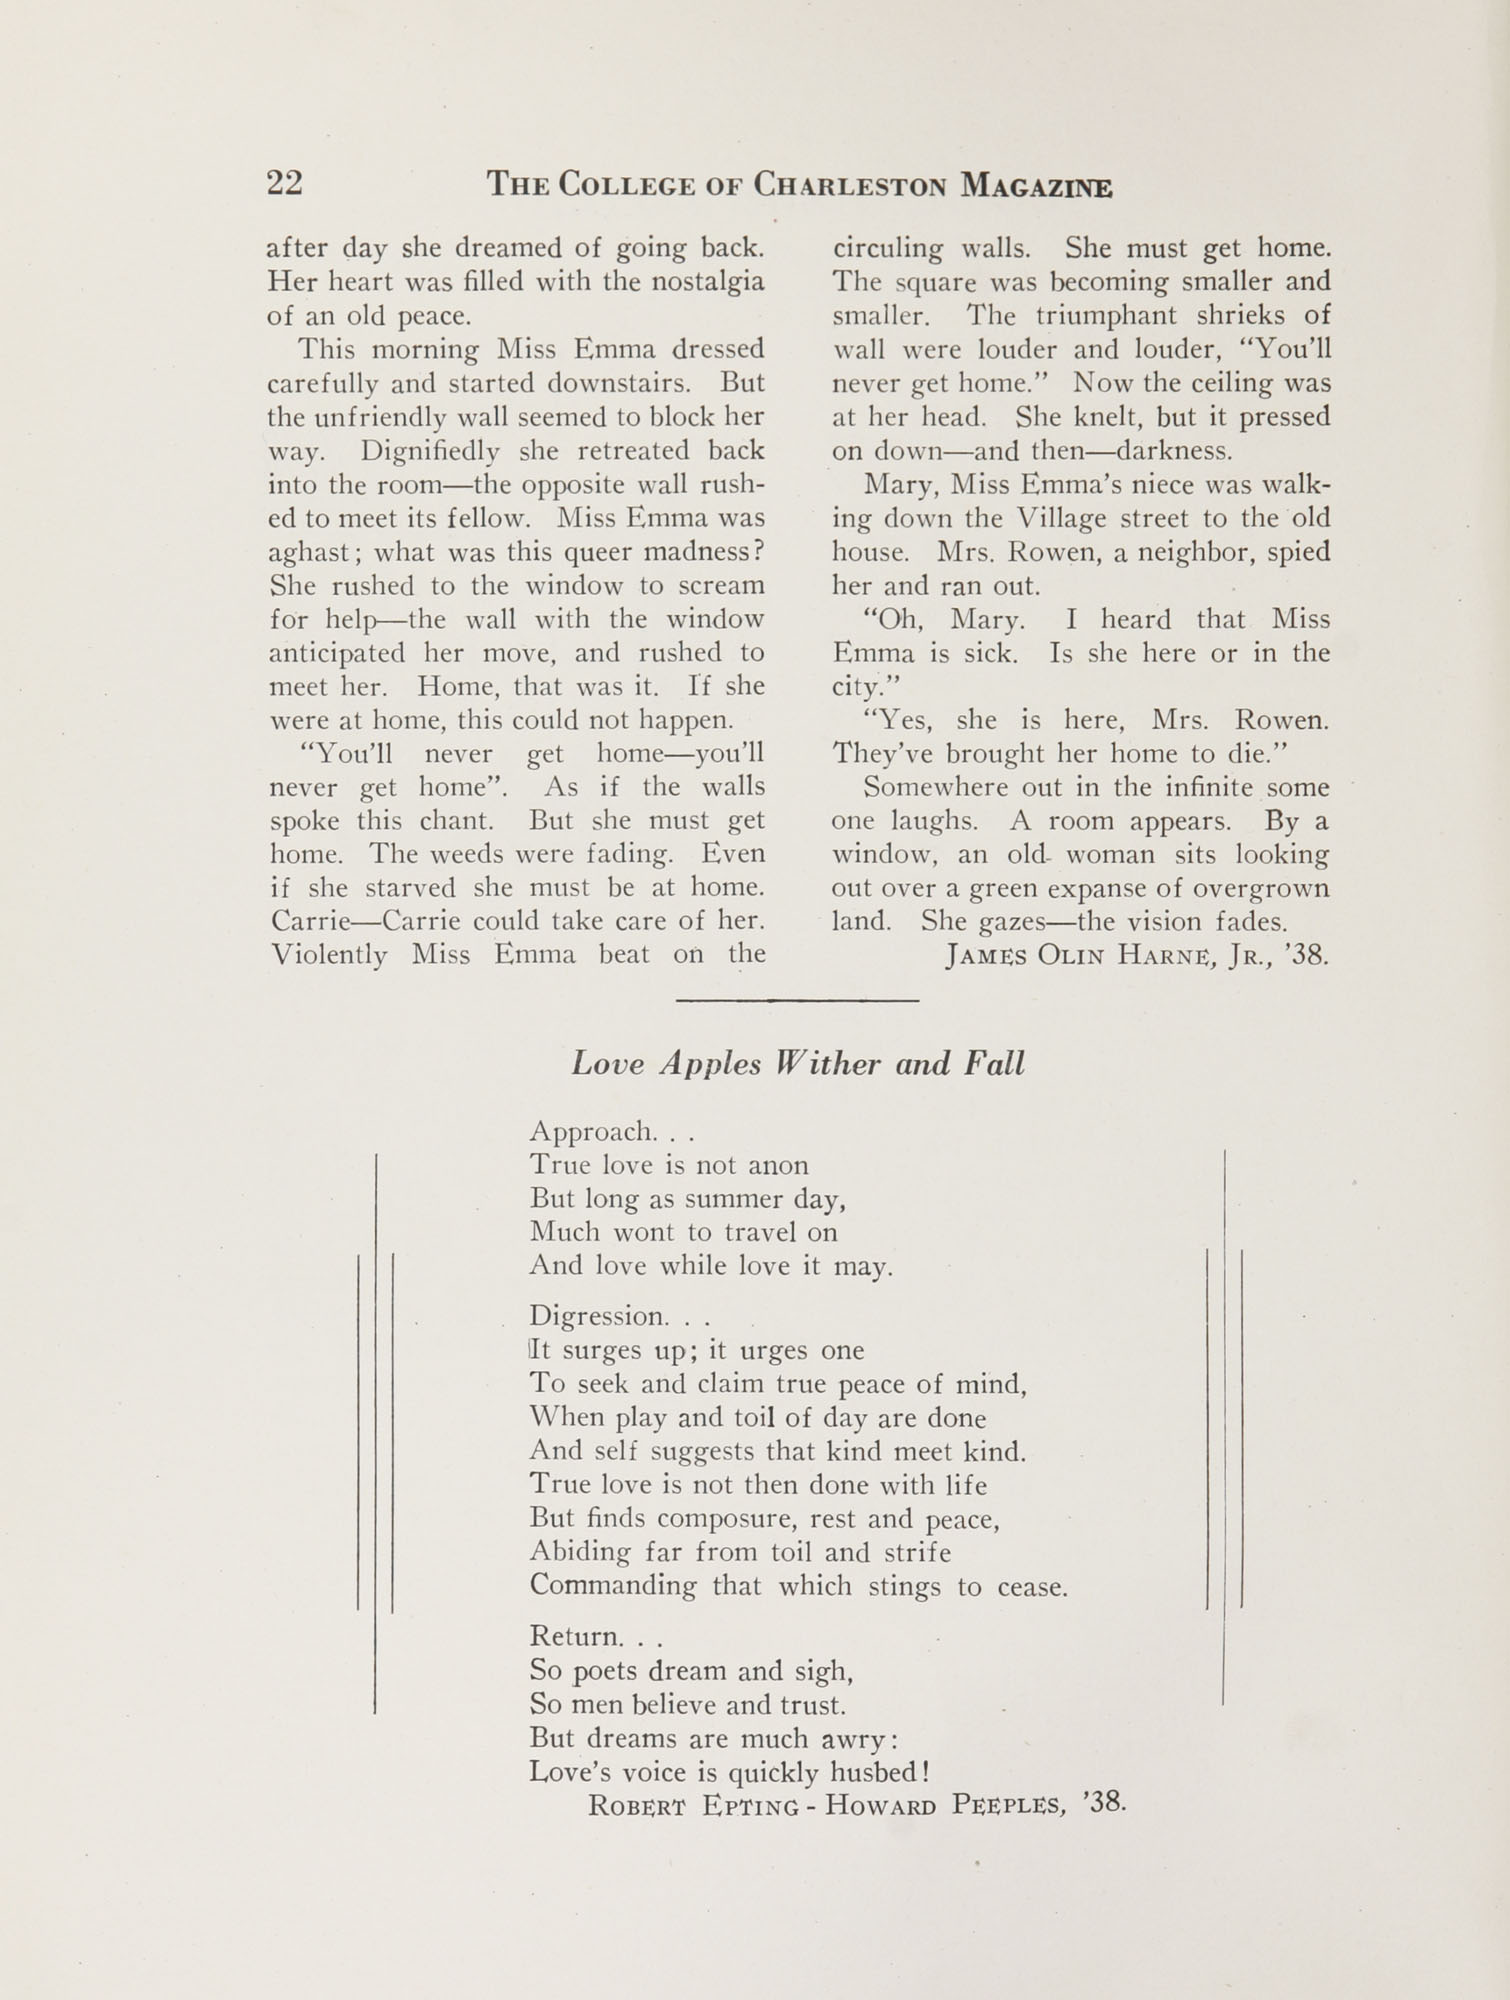 College of Charleston Magazine, 1937-1938, Vol. XXXXI No. 1, page 22